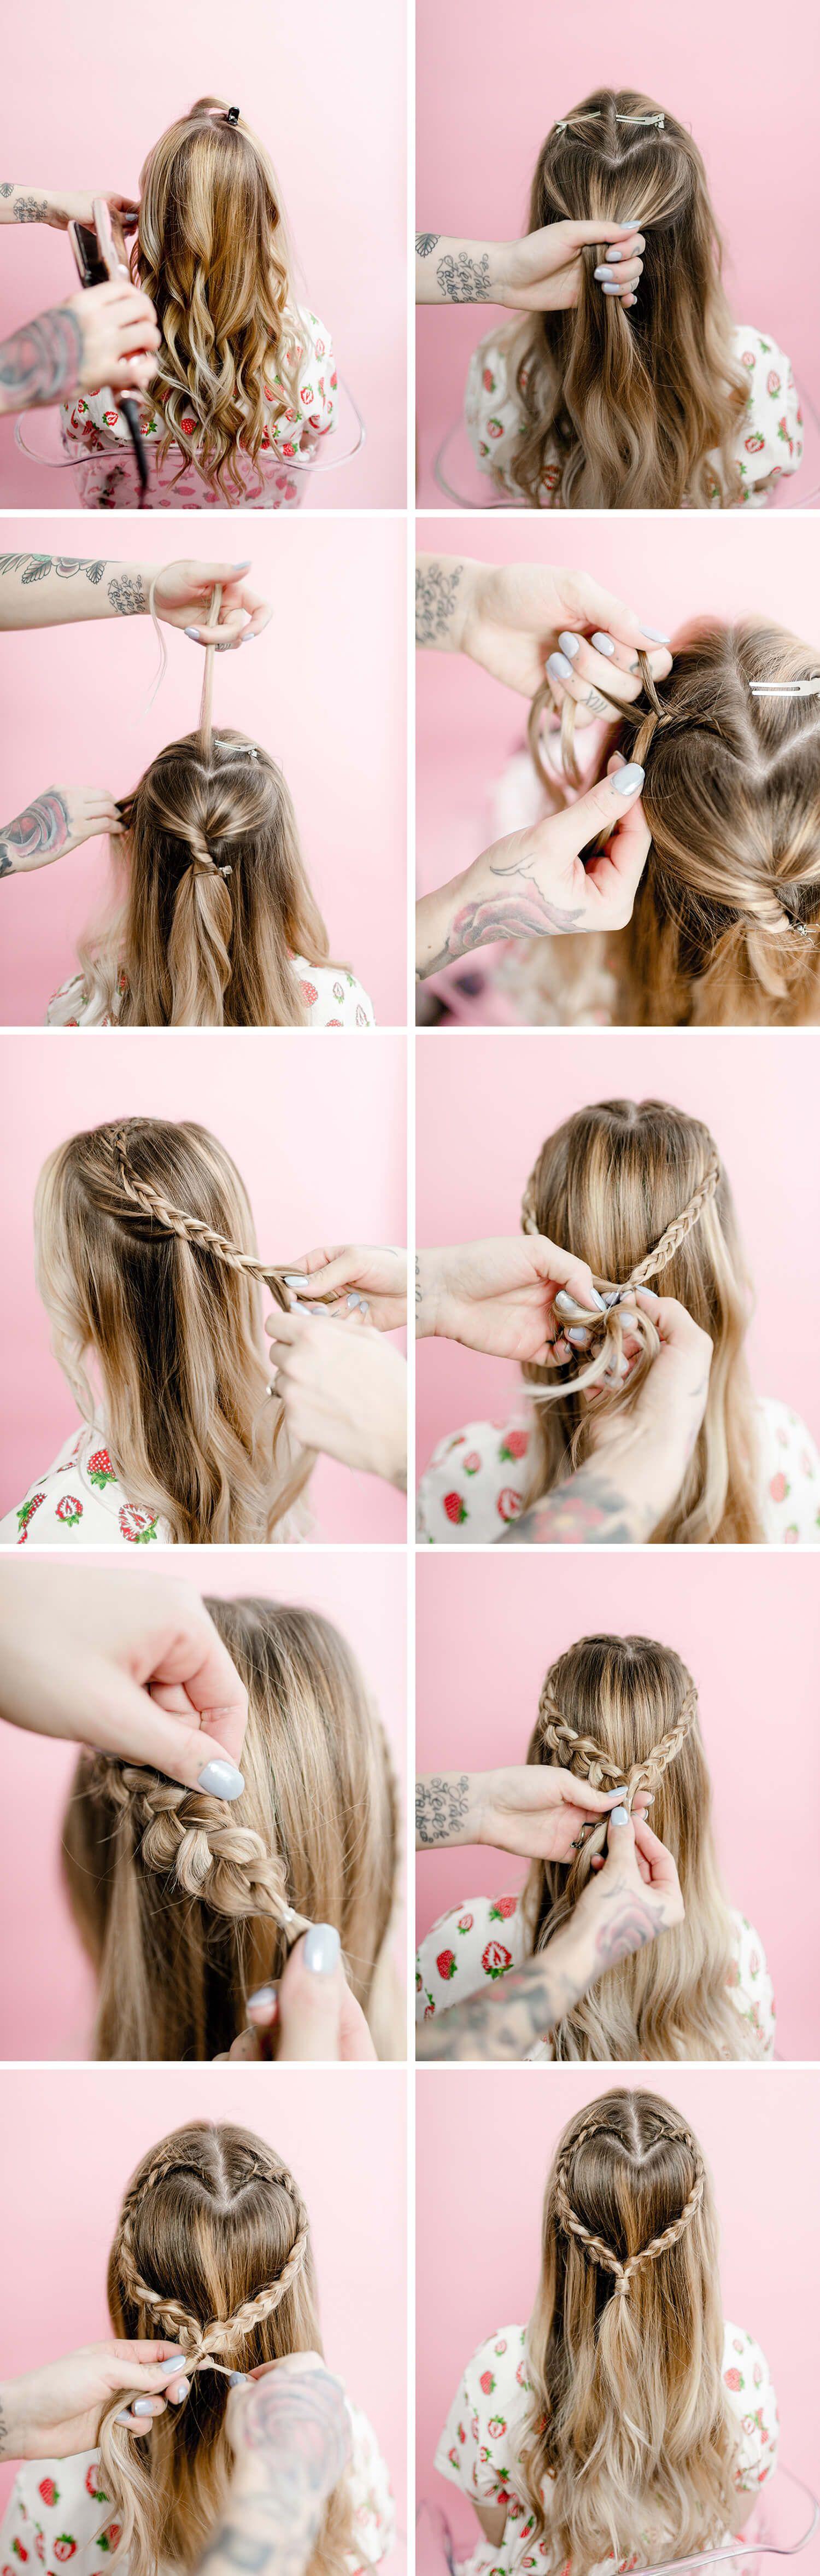 Easy heart-shaped braid